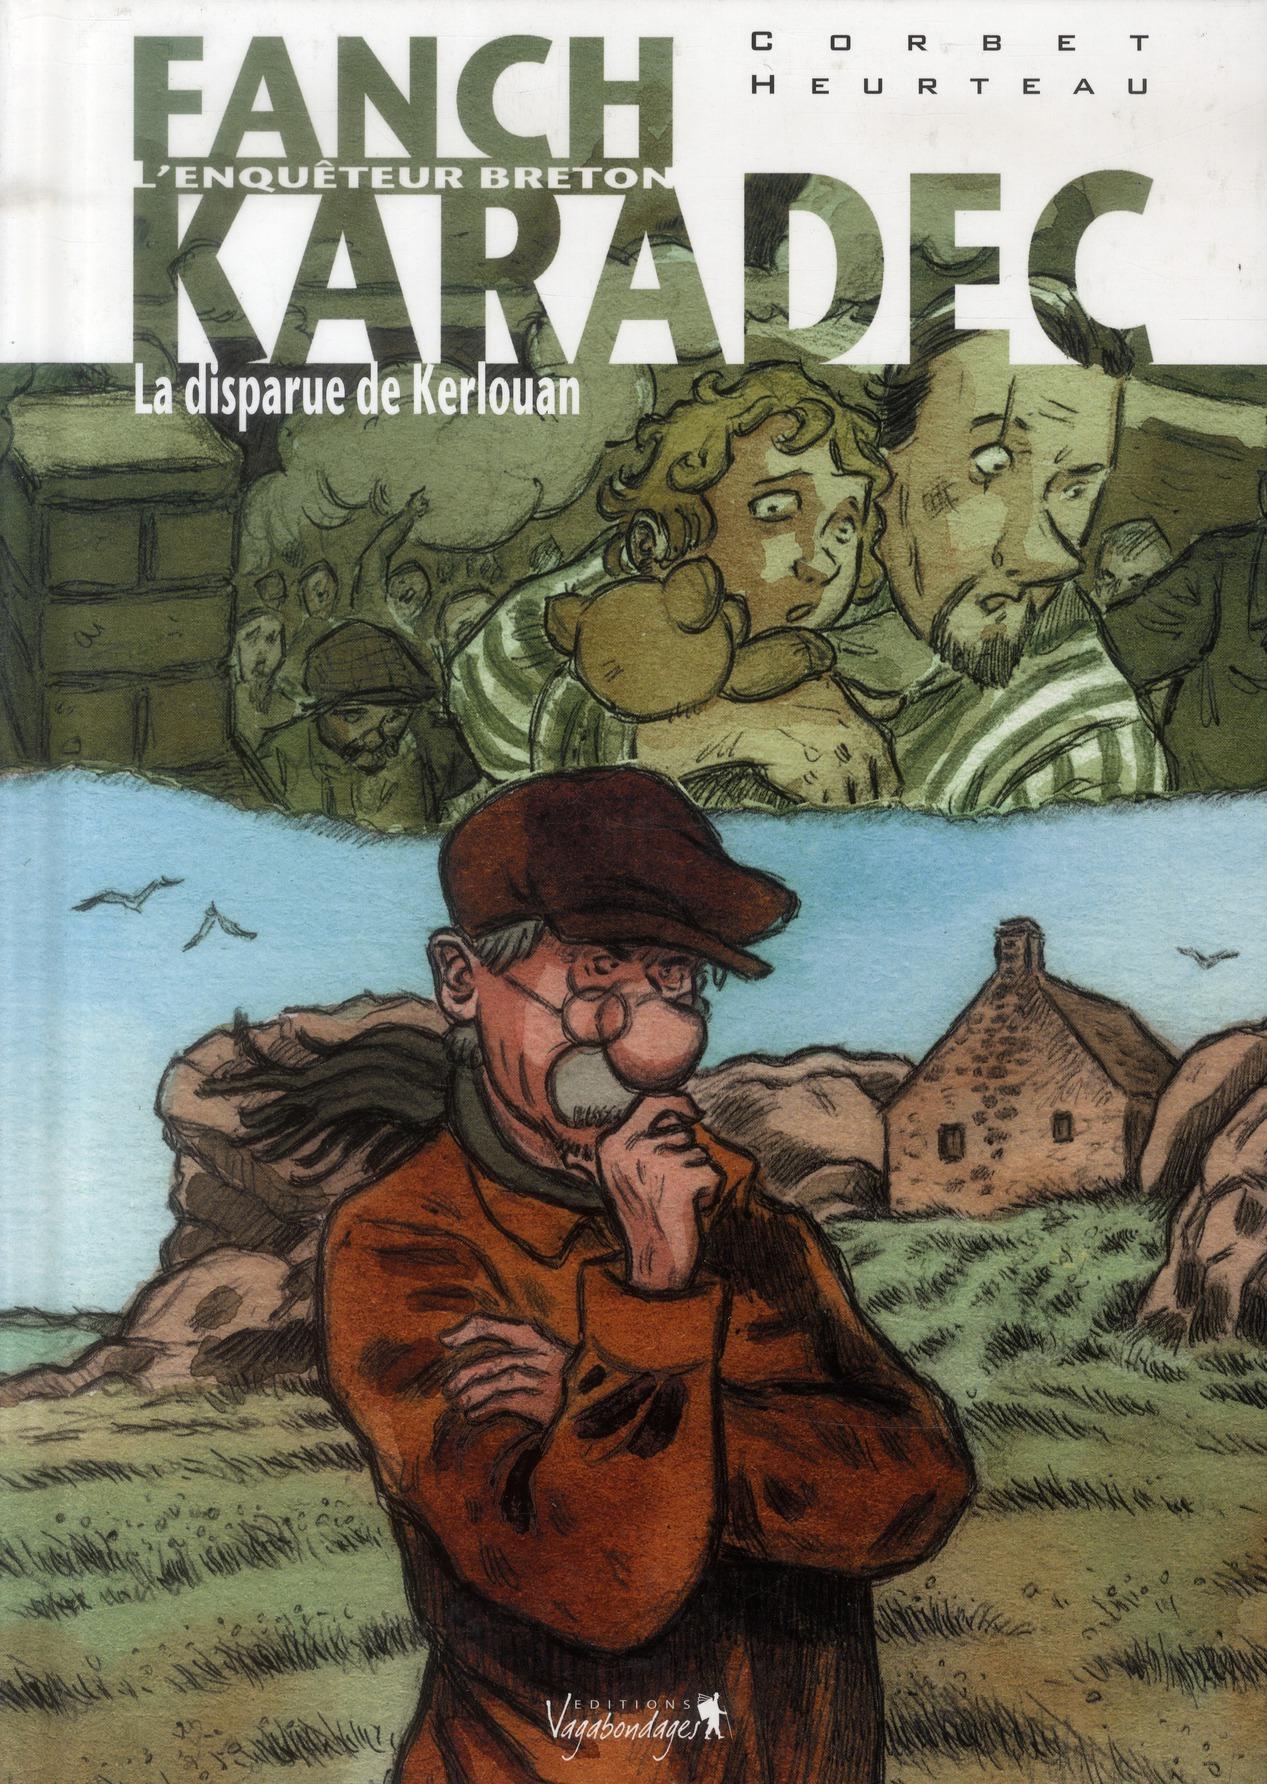 FANCH KARADEC - TOME 3 : LA DISPARUE DE KERLOUAN Corbet Sébastien Vagabondages